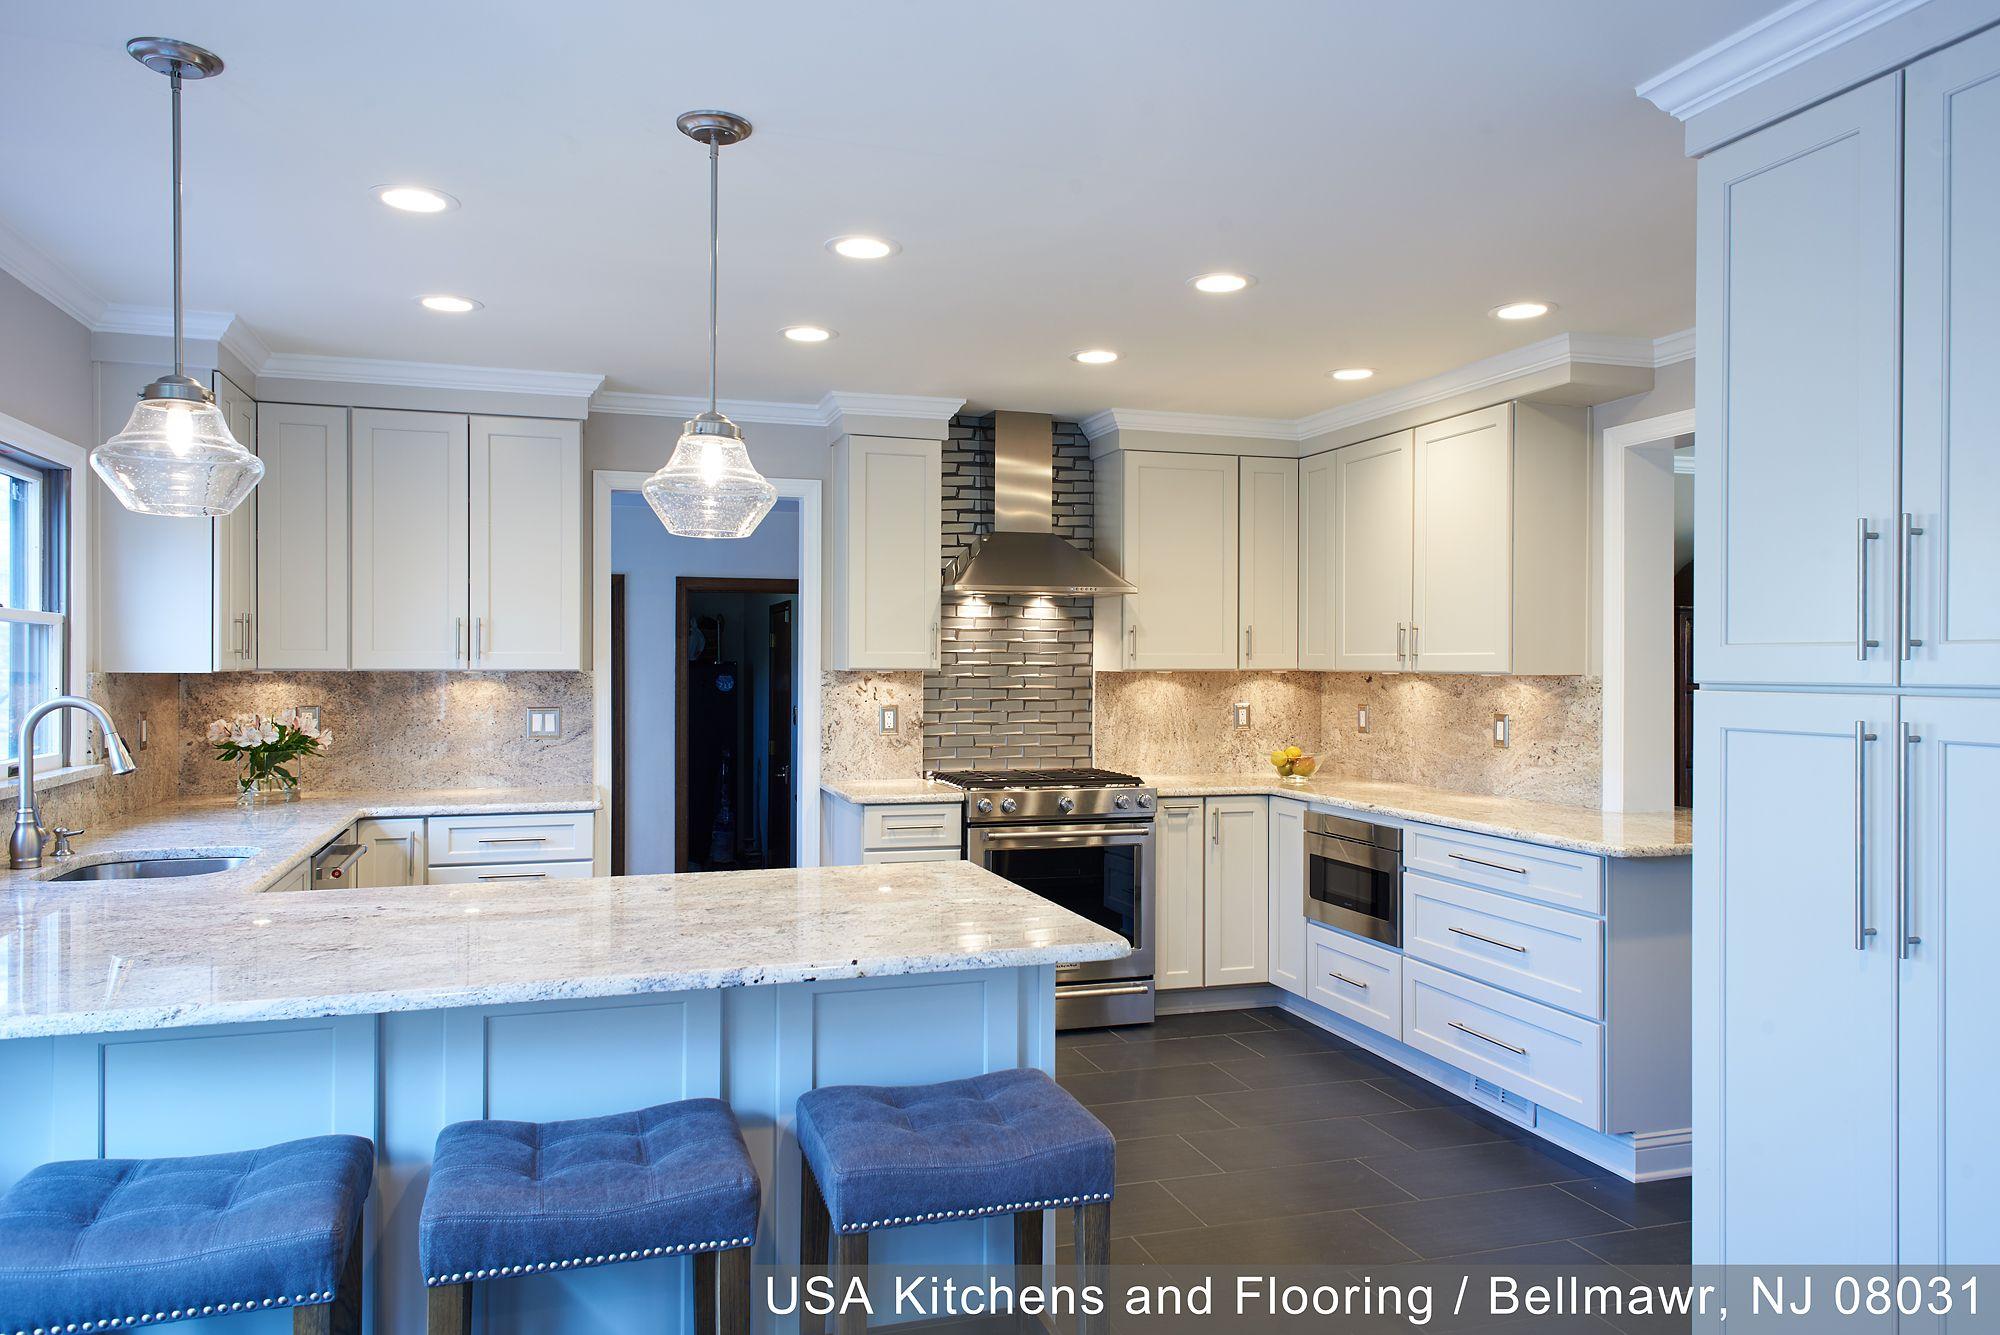 Medallion Dana Point Irish Cream Kitchen Cabinetry Island Pennisula Kitchen Cabinets And Countertops Kitchen Redo Kitchen Design